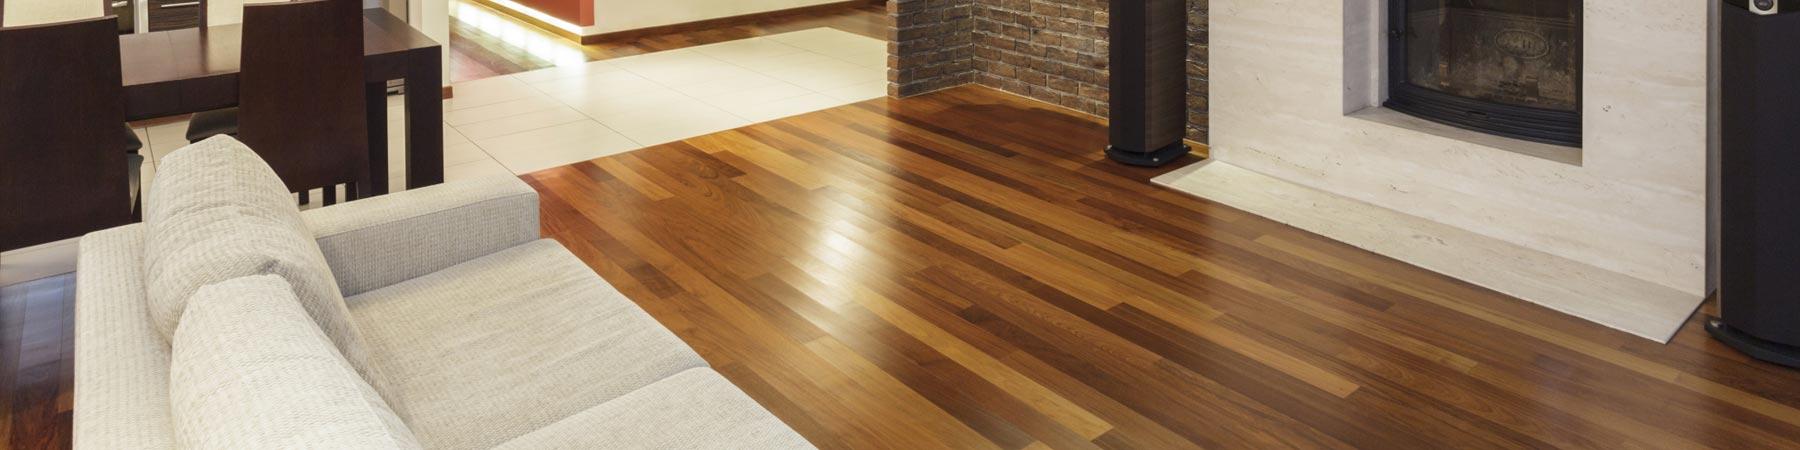 Laminate Flooring Specialists Aa Plus Flooring Sydney